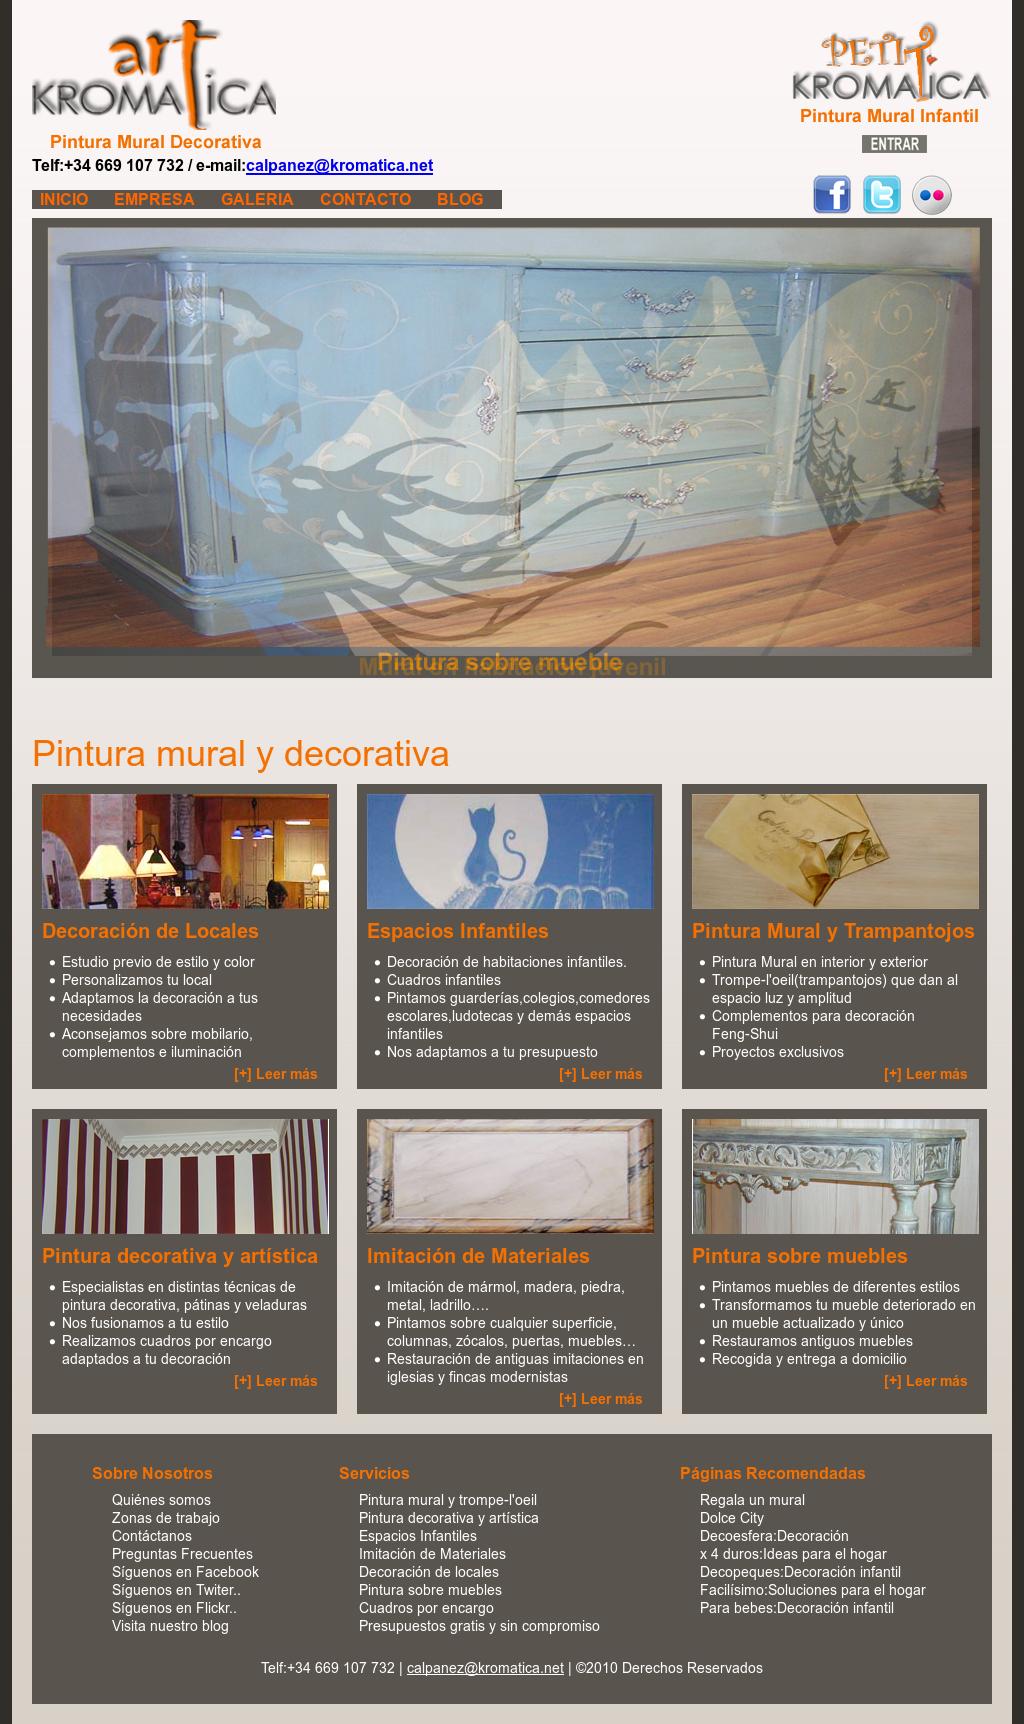 Art Kromatica Competitors, Revenue and Employees - Owler Company Profile